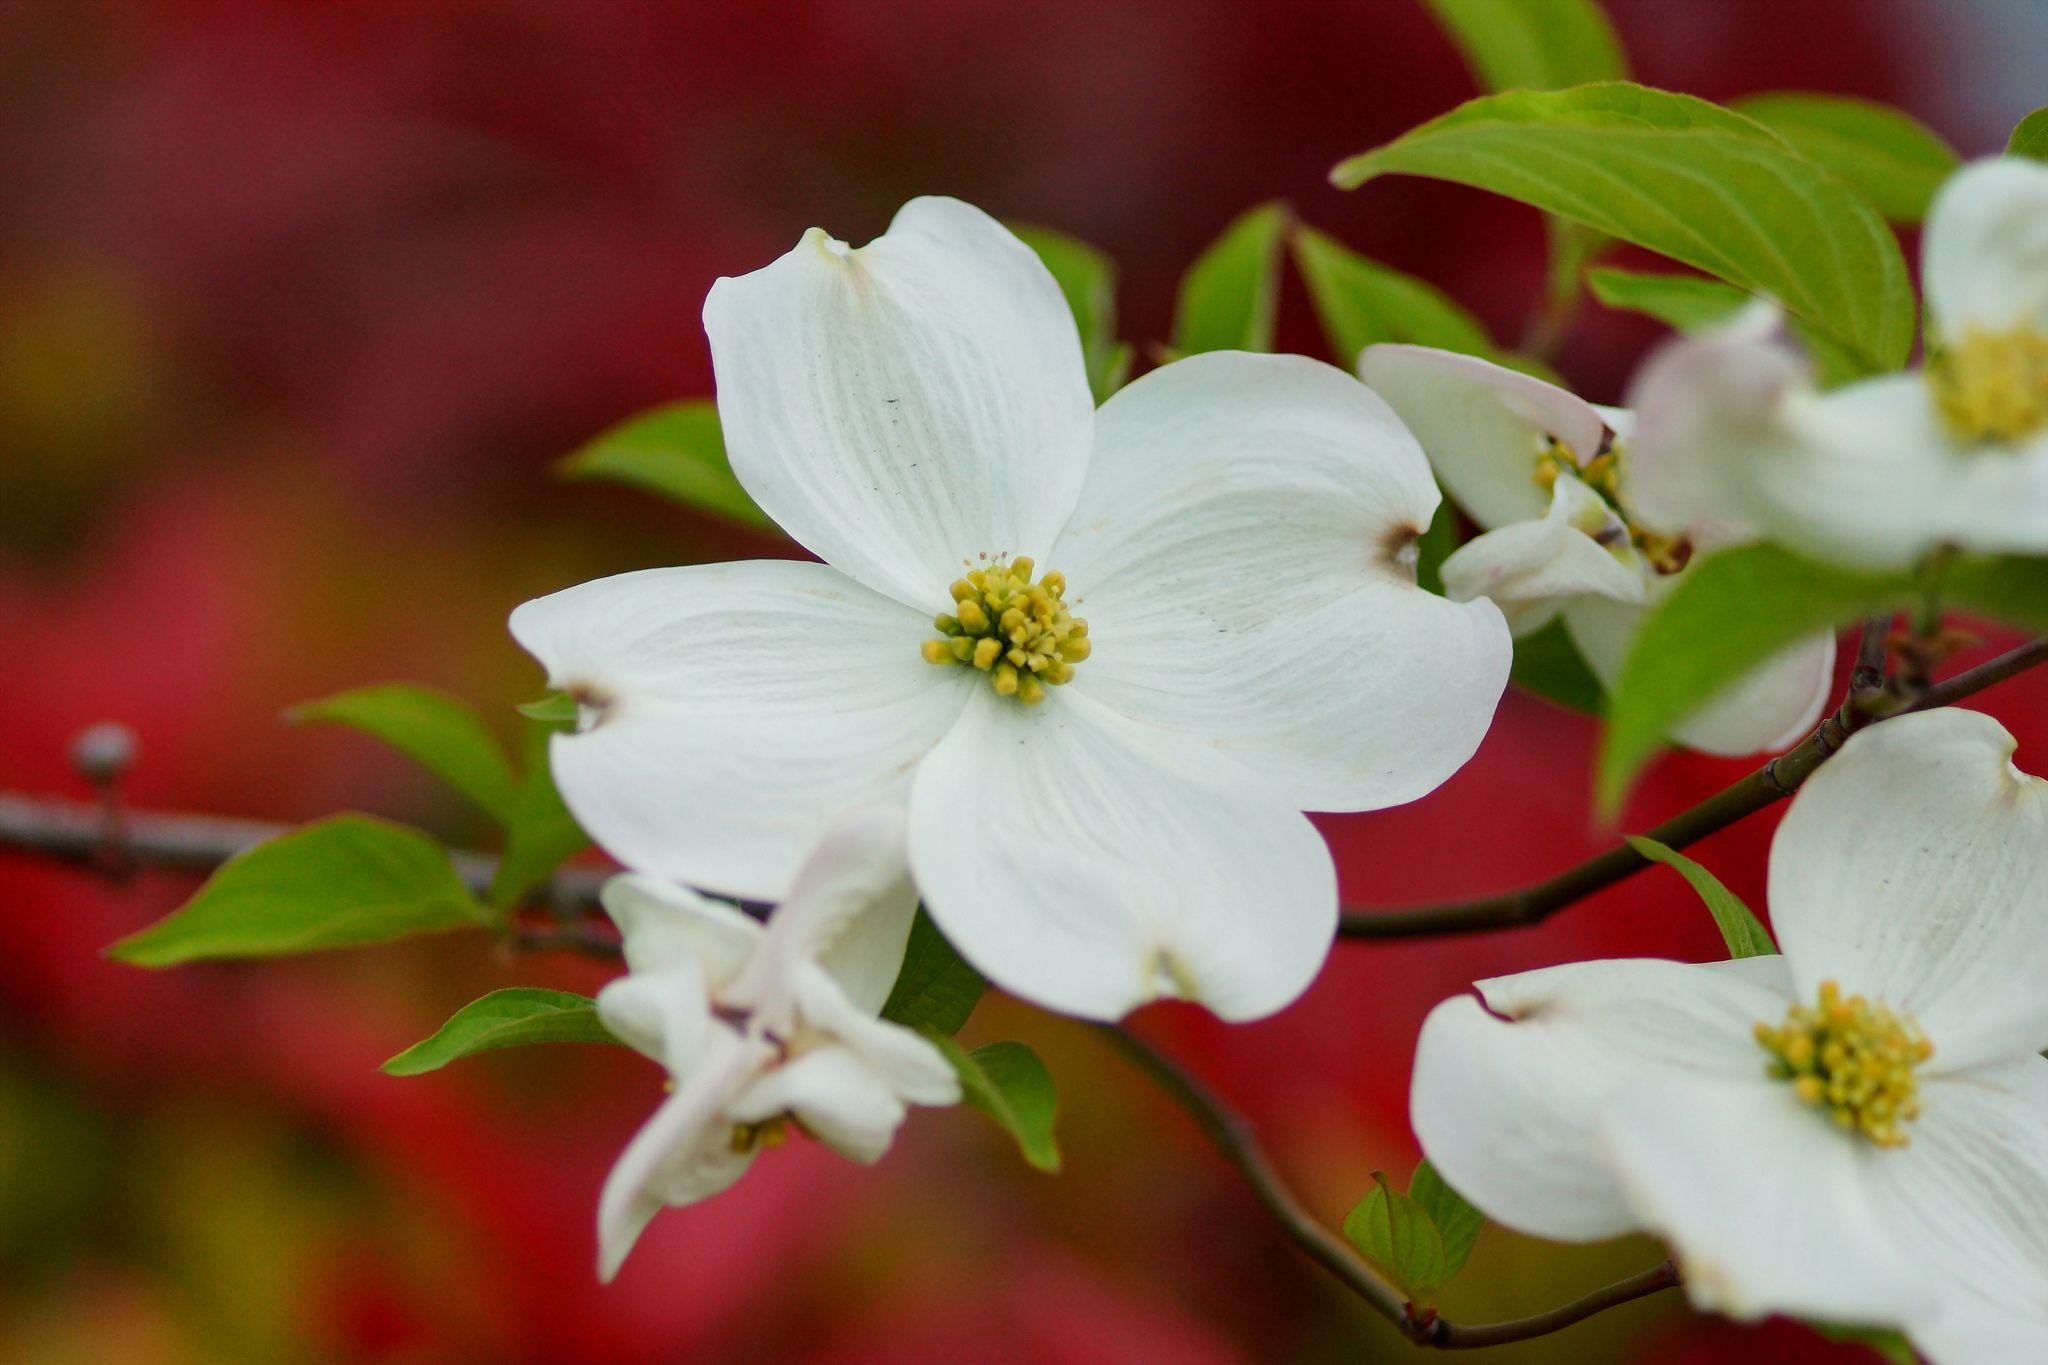 https://flic.kr/p/egTcuG   はなみずき (花水木)/Cornus florida   20130421-DSC08107 花の回廊 はなみずき (花水木)/Cornus florida ミズキ科ヤマボウシ属英名 Flowering dogwood, Eastern flowering dogwood